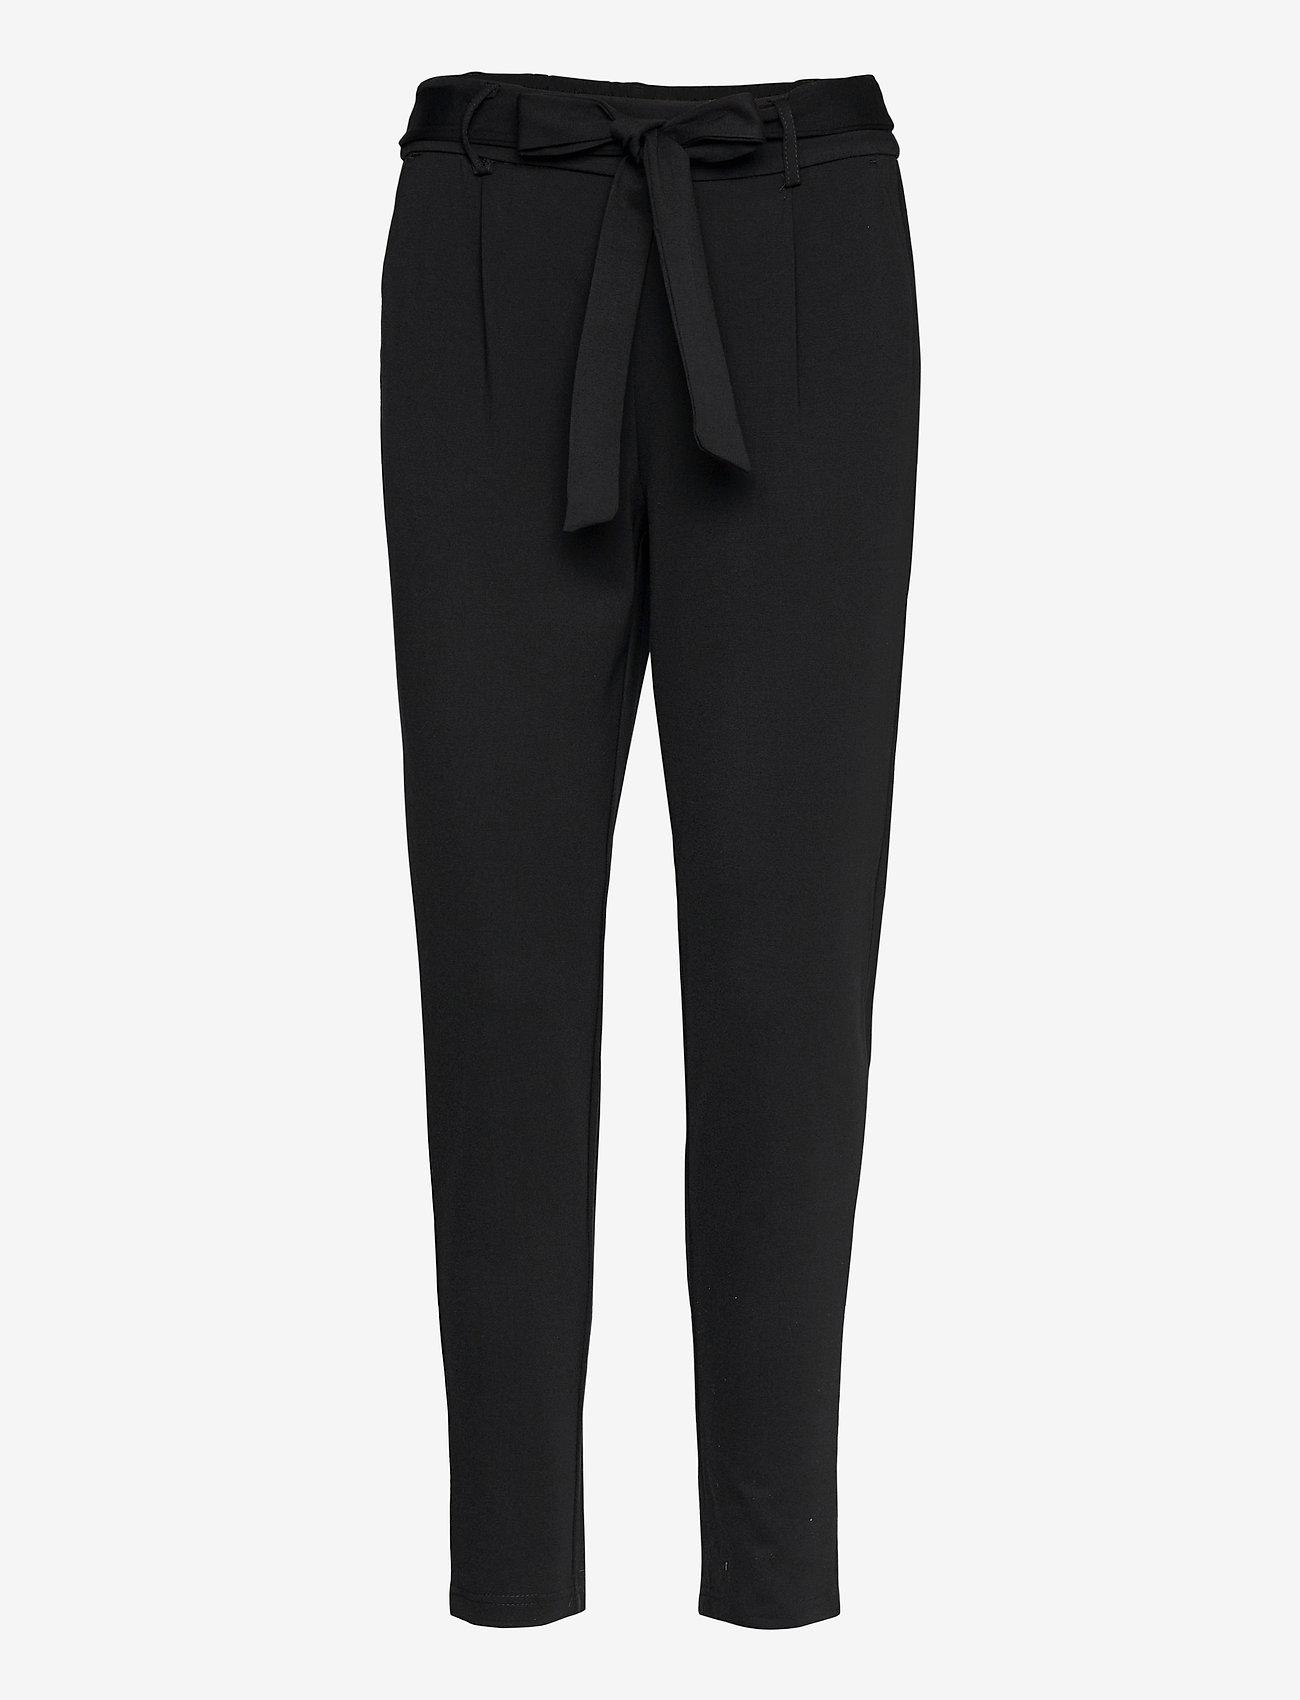 MOSS COPENHAGEN - Popye Pants - slim fit bukser - black - 0